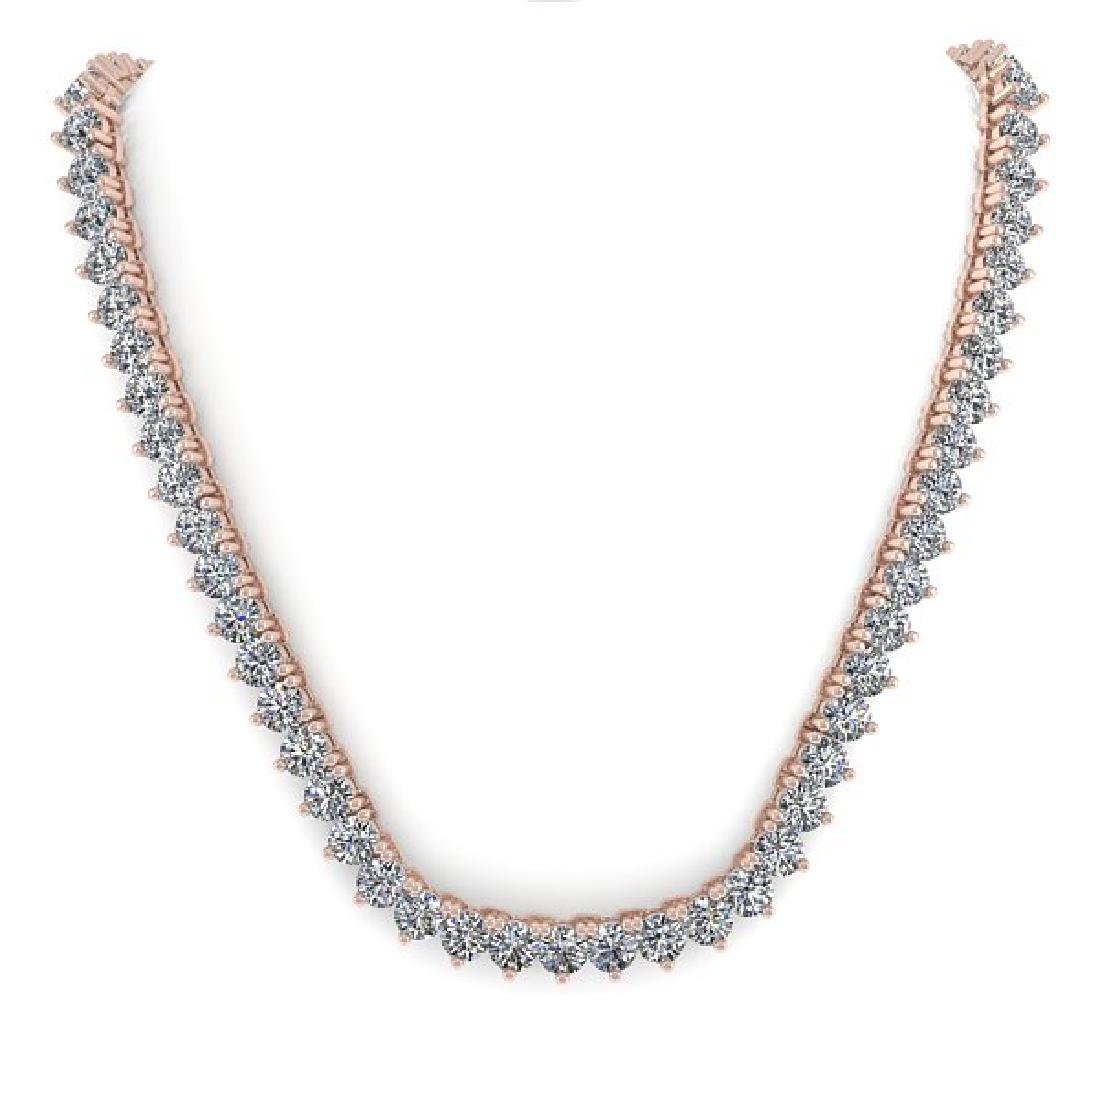 20 CTW Solitaire VS/SI Diamond Necklace 18K Rose Gold - 3